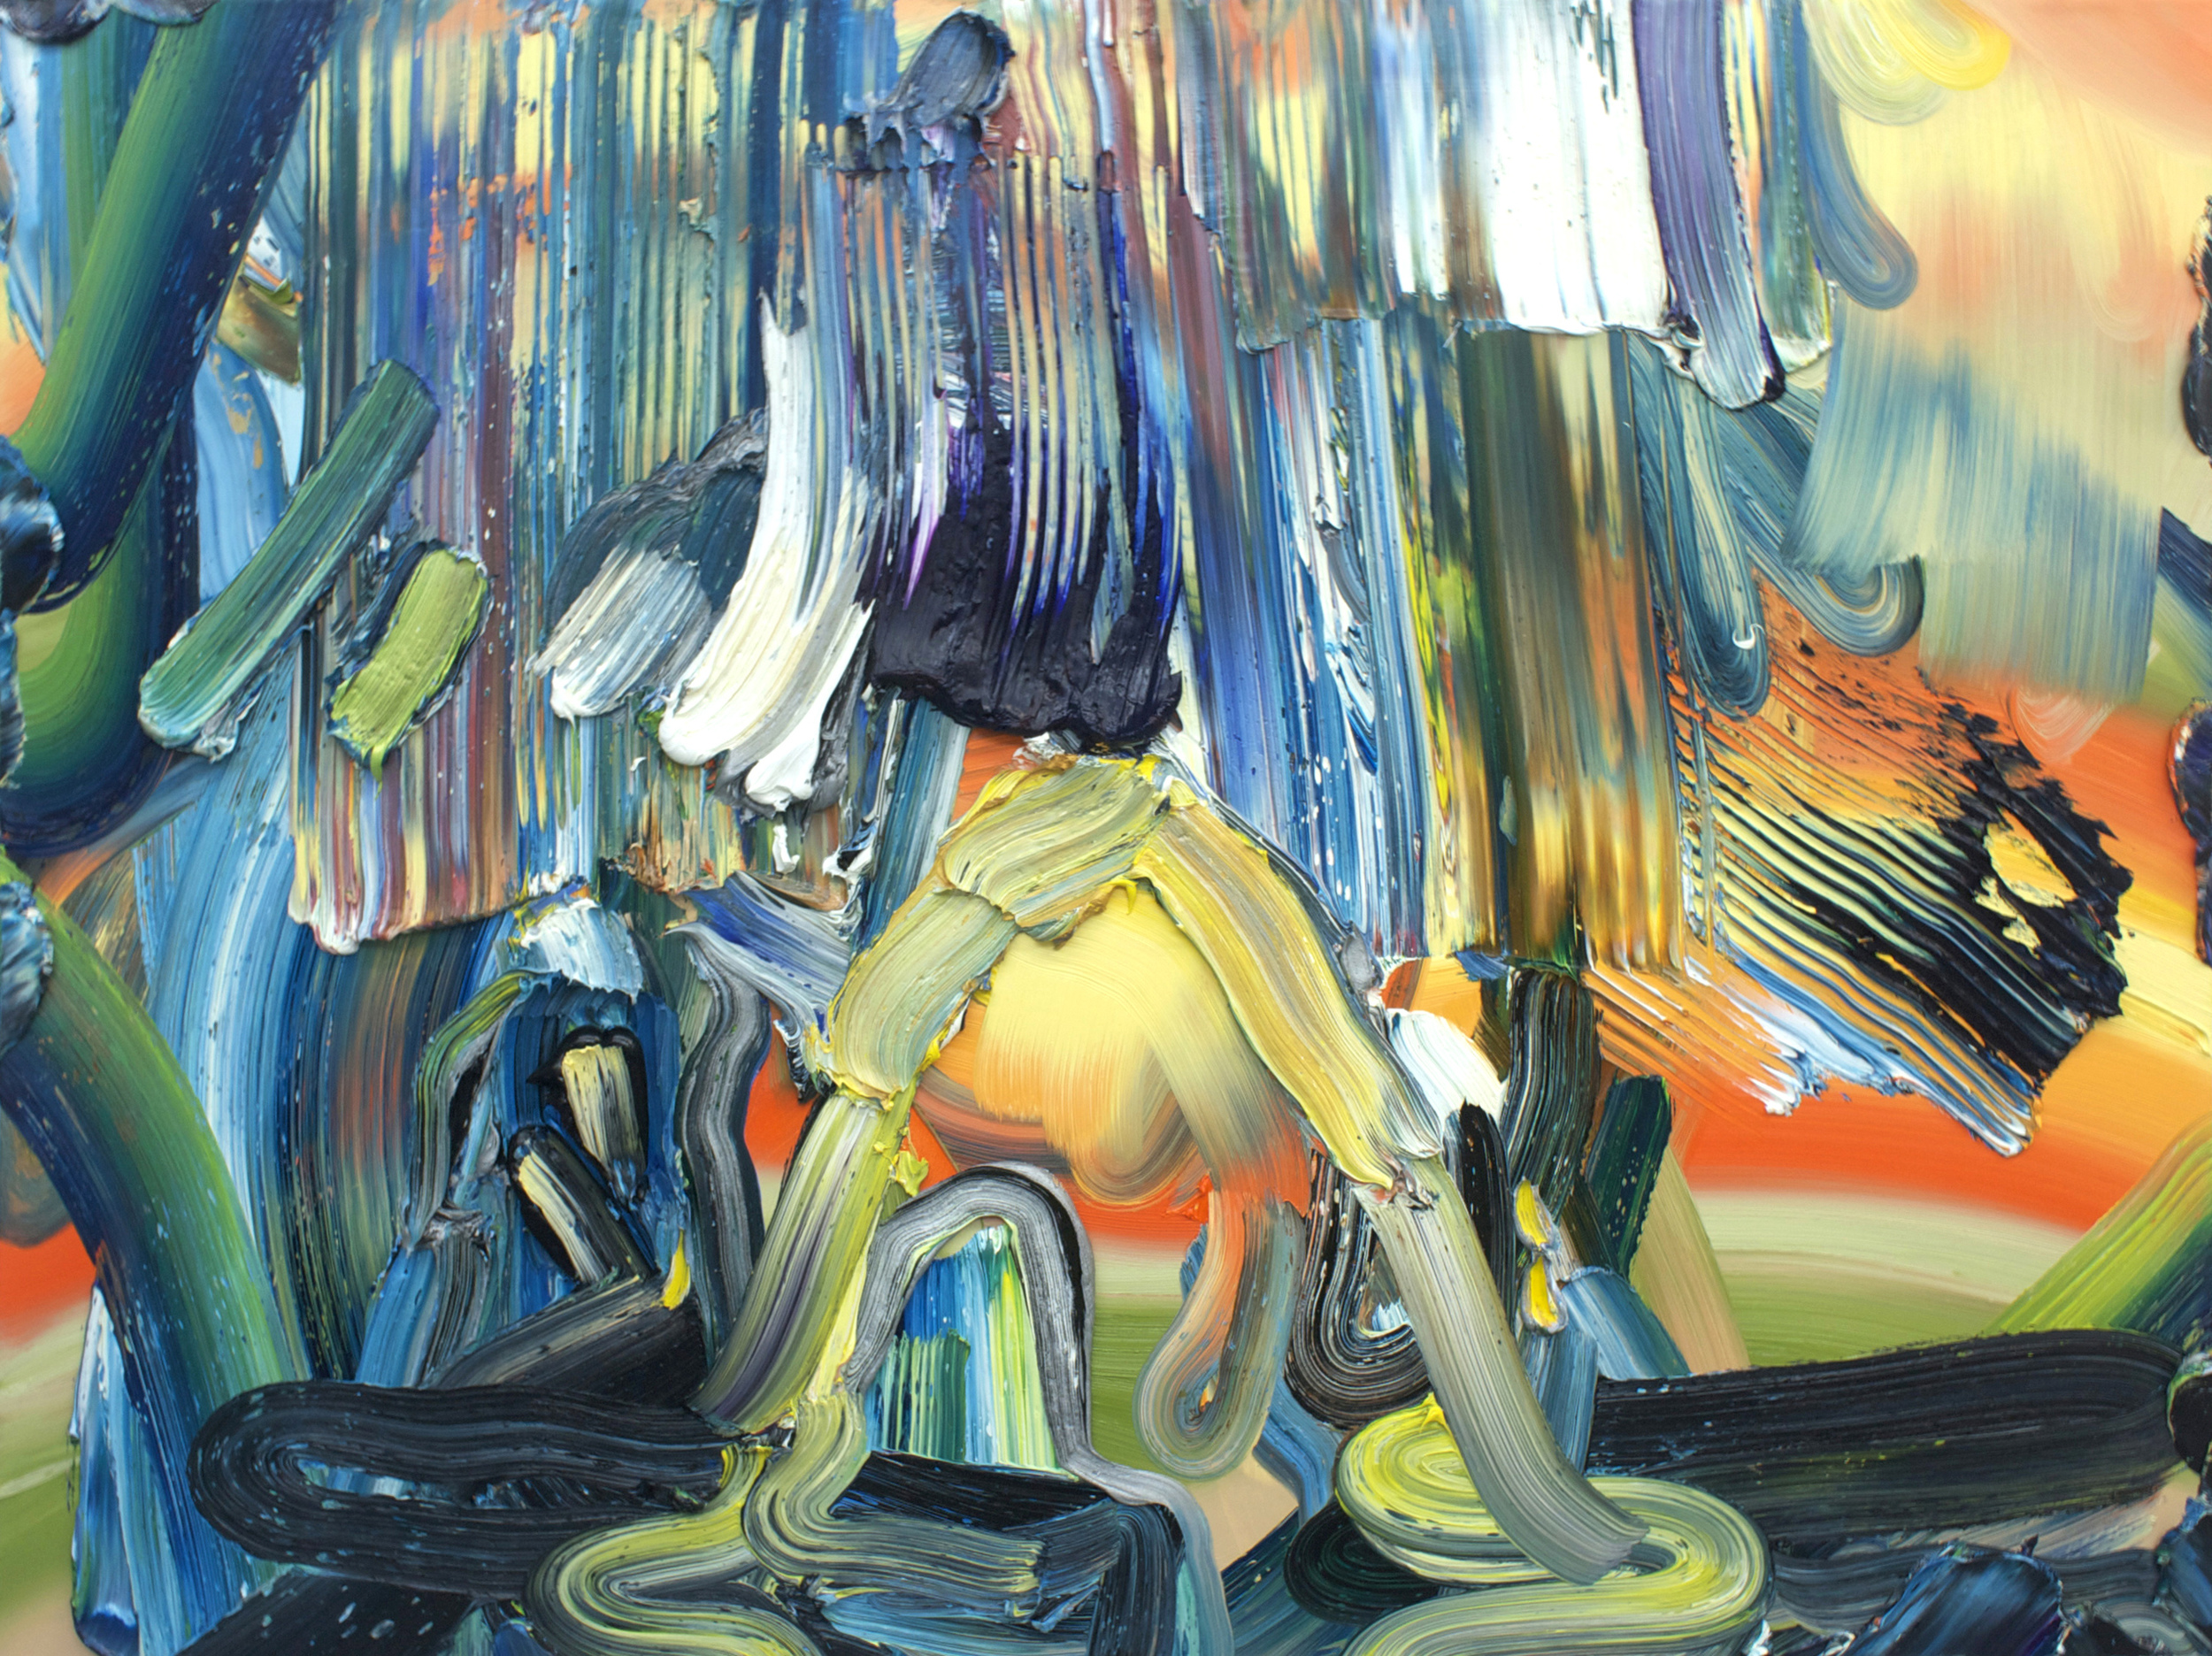 Hail / oil on canvas / 30 x 40 inches